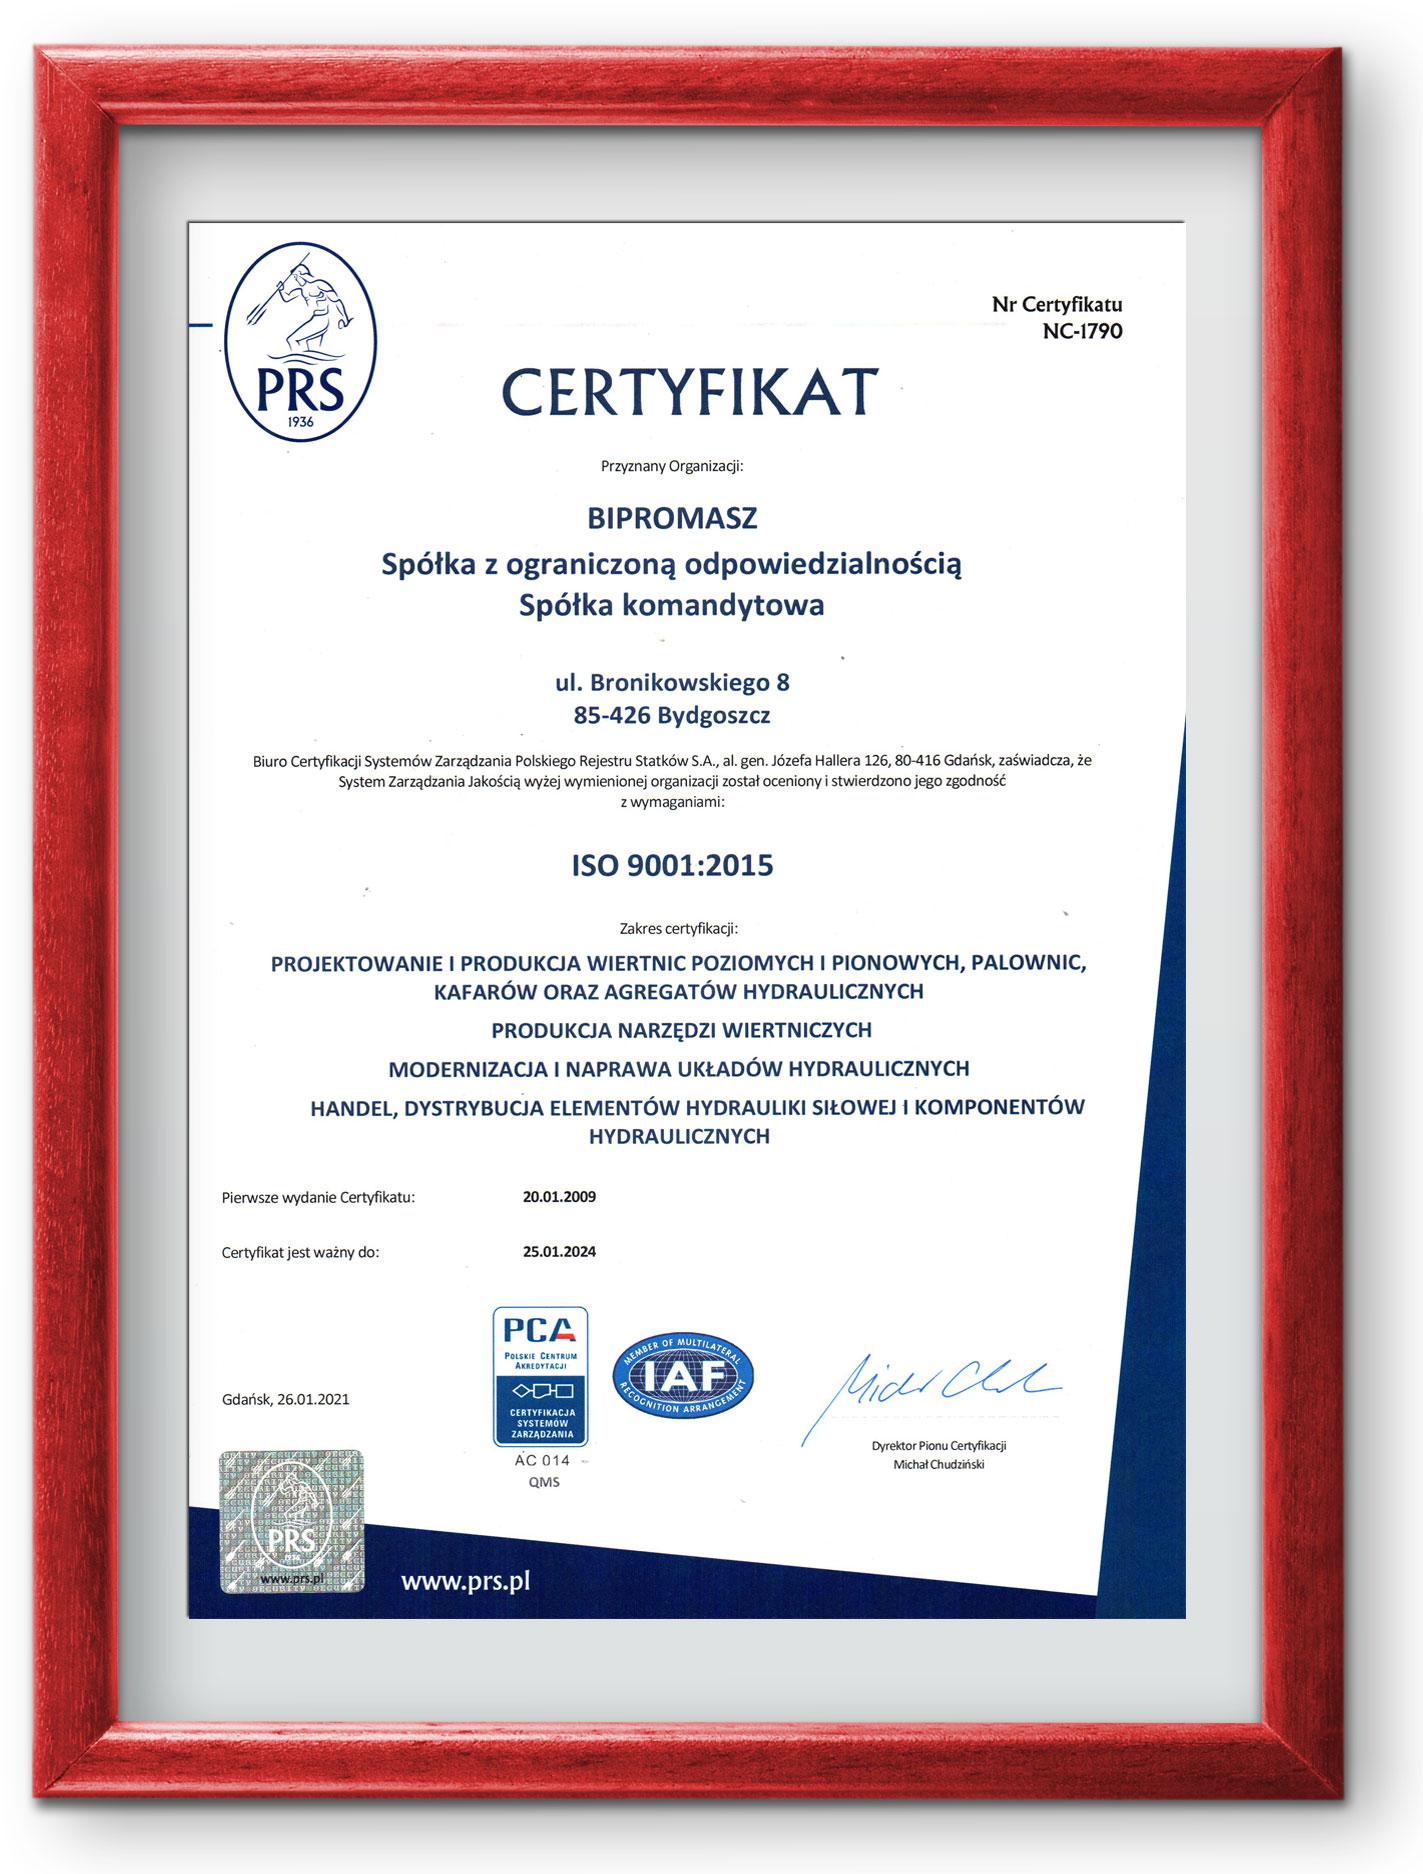 Certyfikat-ISO-Nr-NC-1790